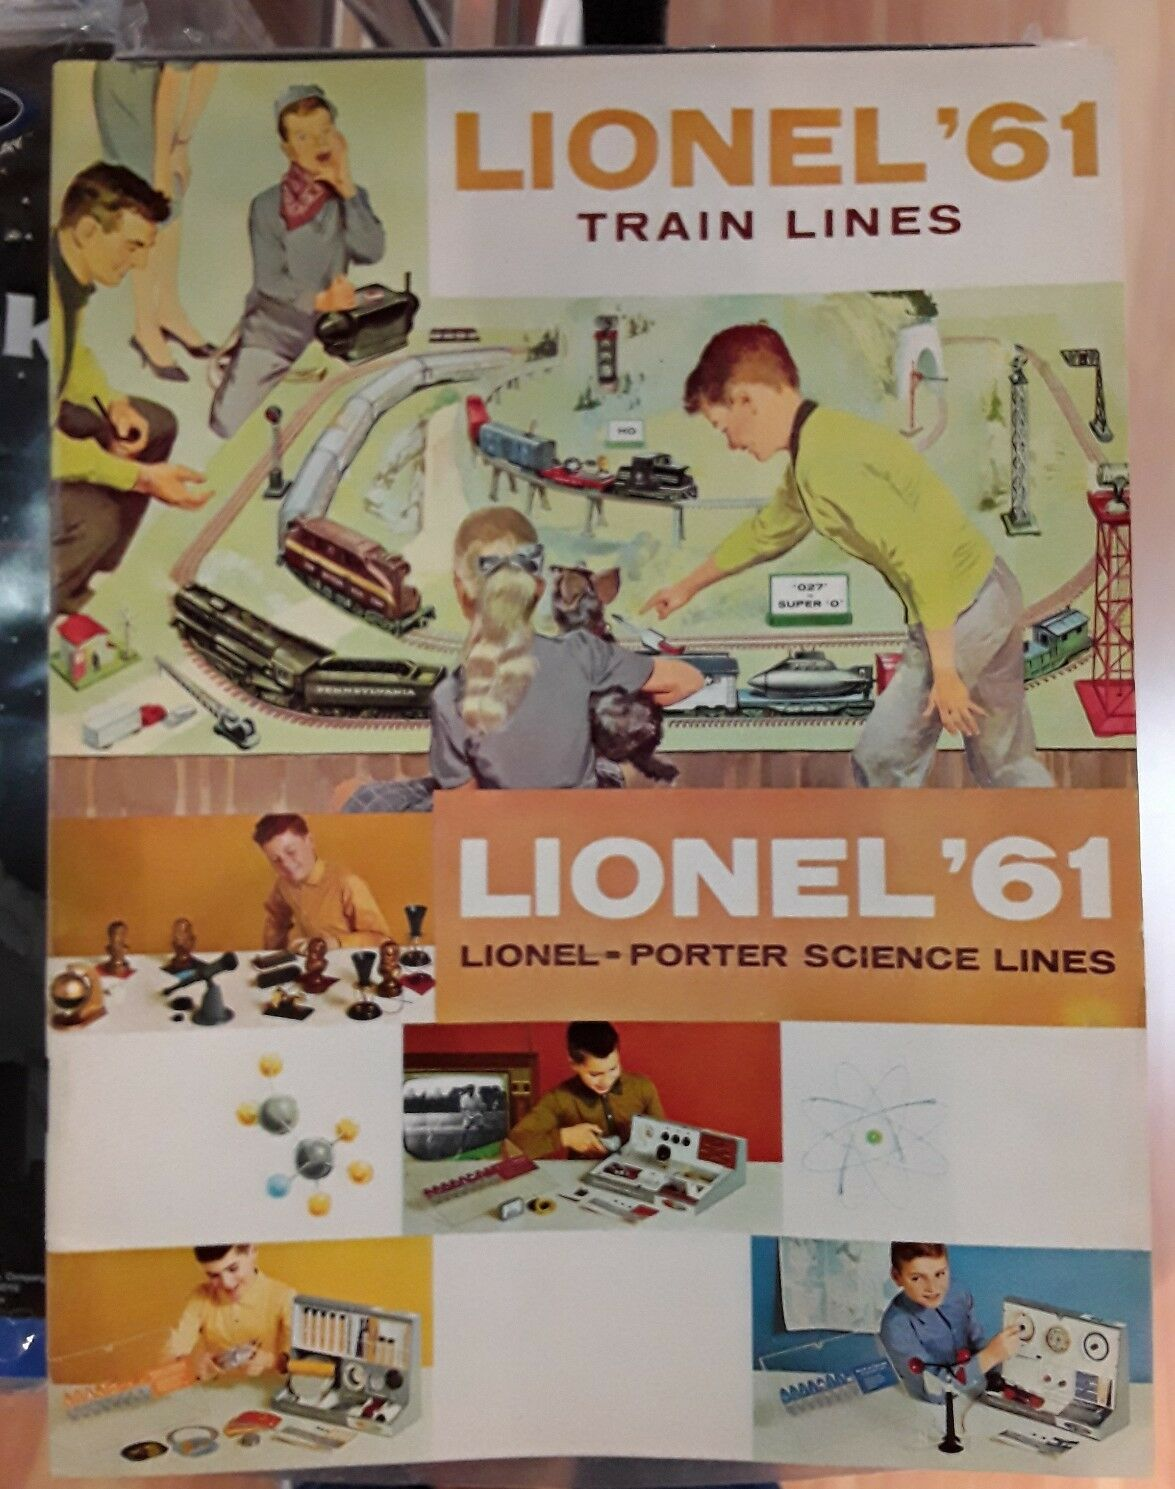 Lionel Train Lines Catalog 1961 full color good condition